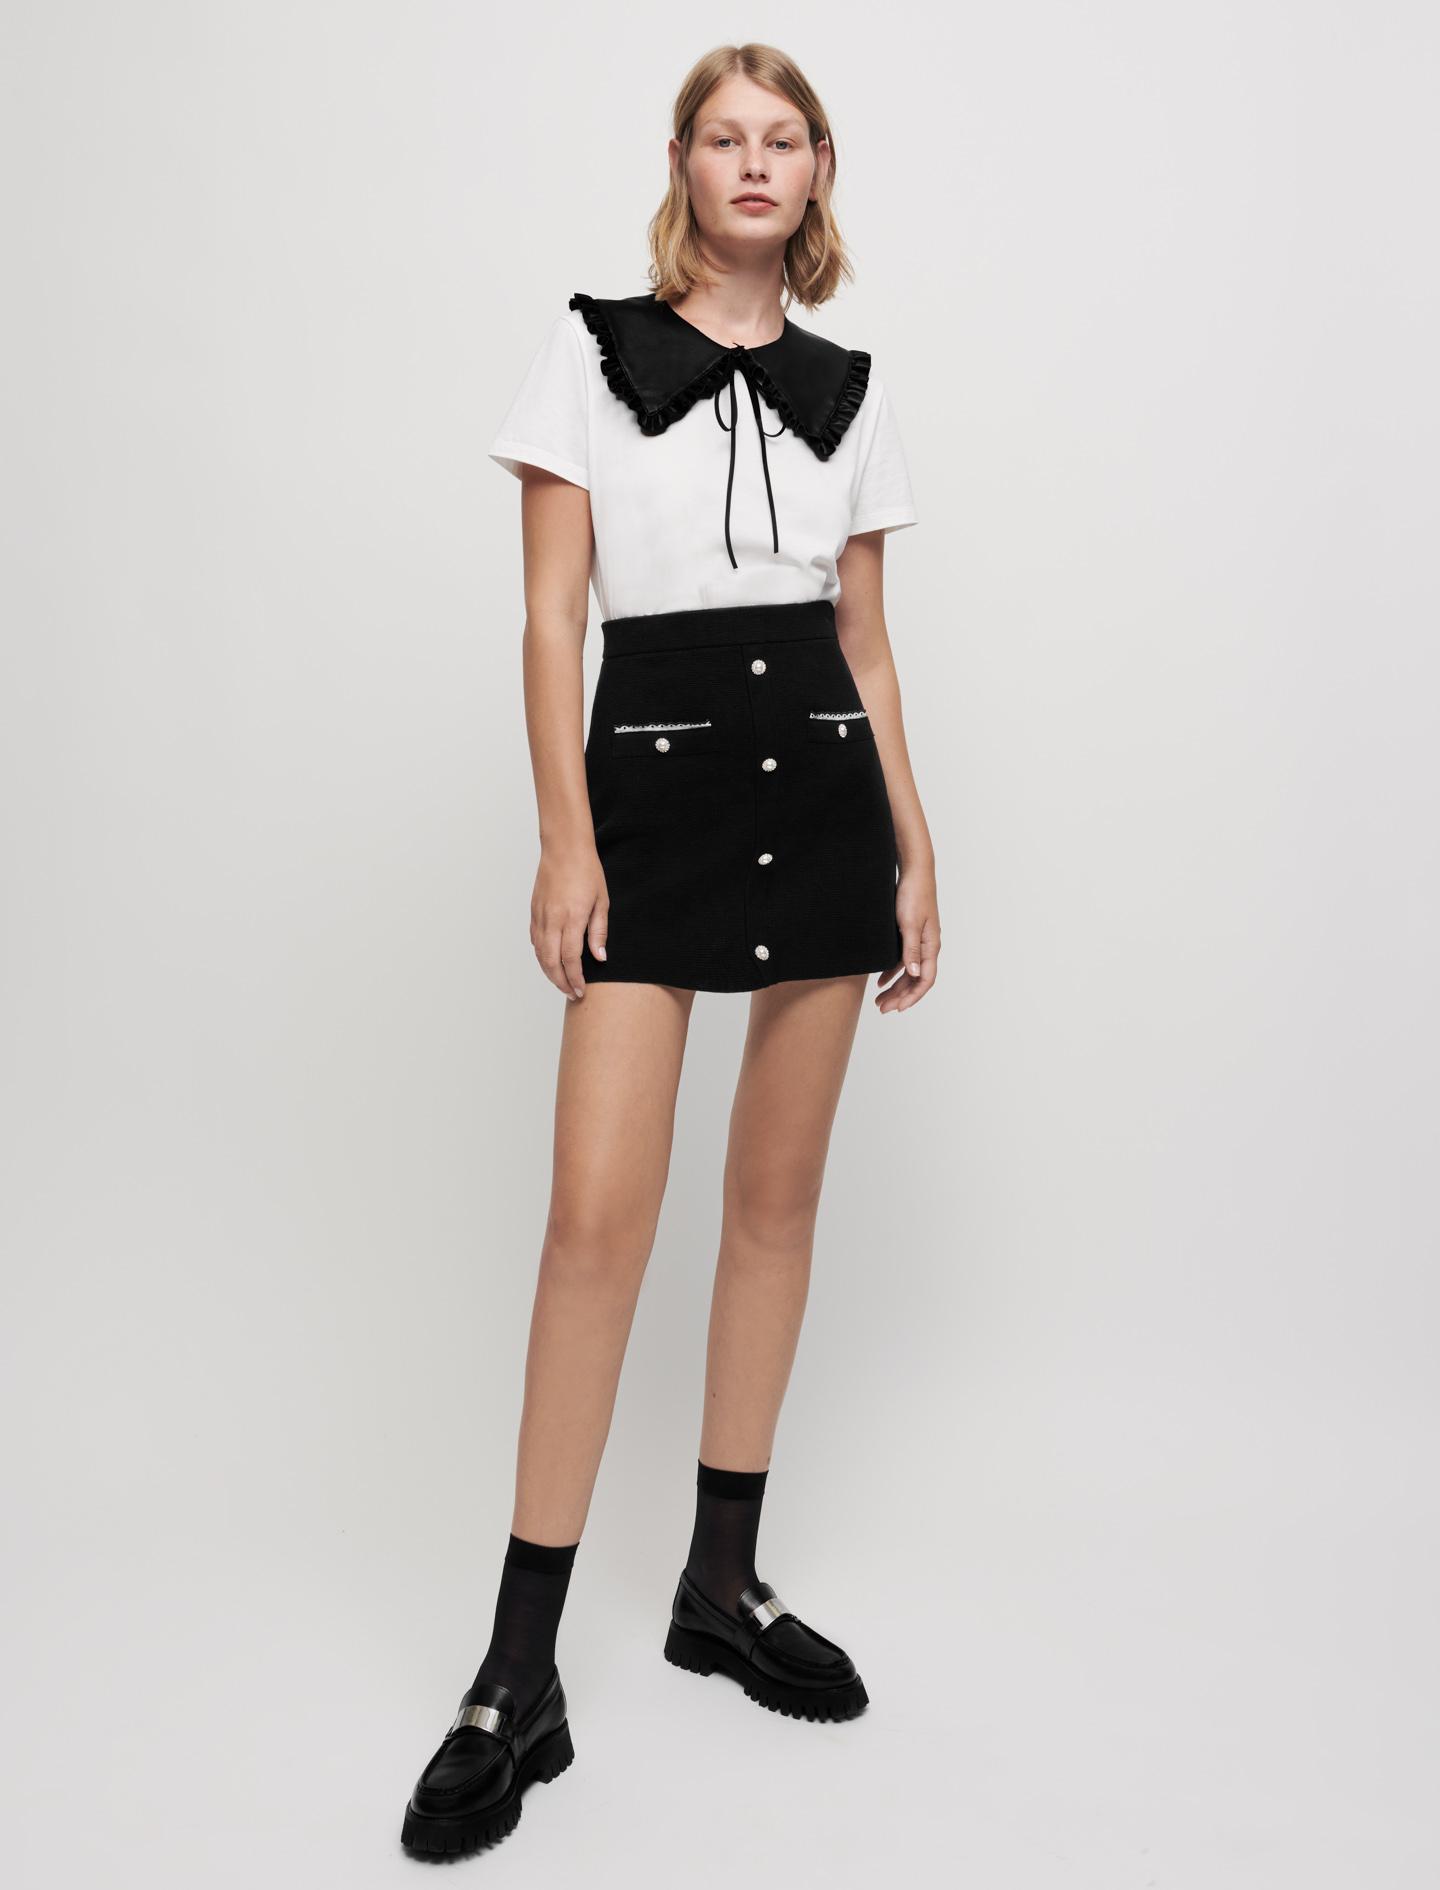 Embroidered poplin knit skirt - Black